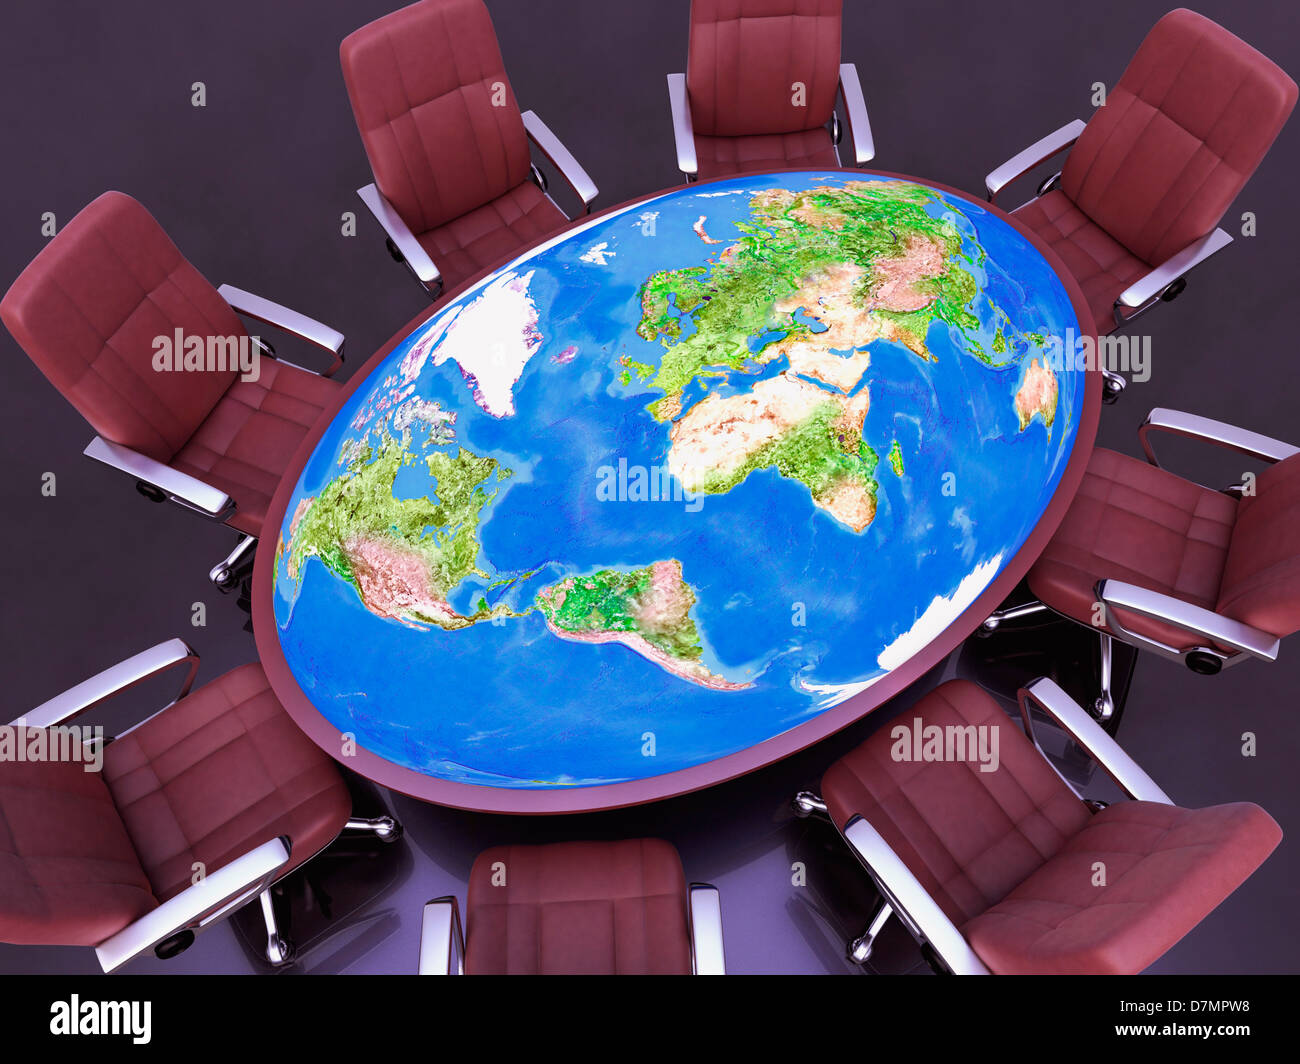 Rapport international, conceptual image Photo Stock